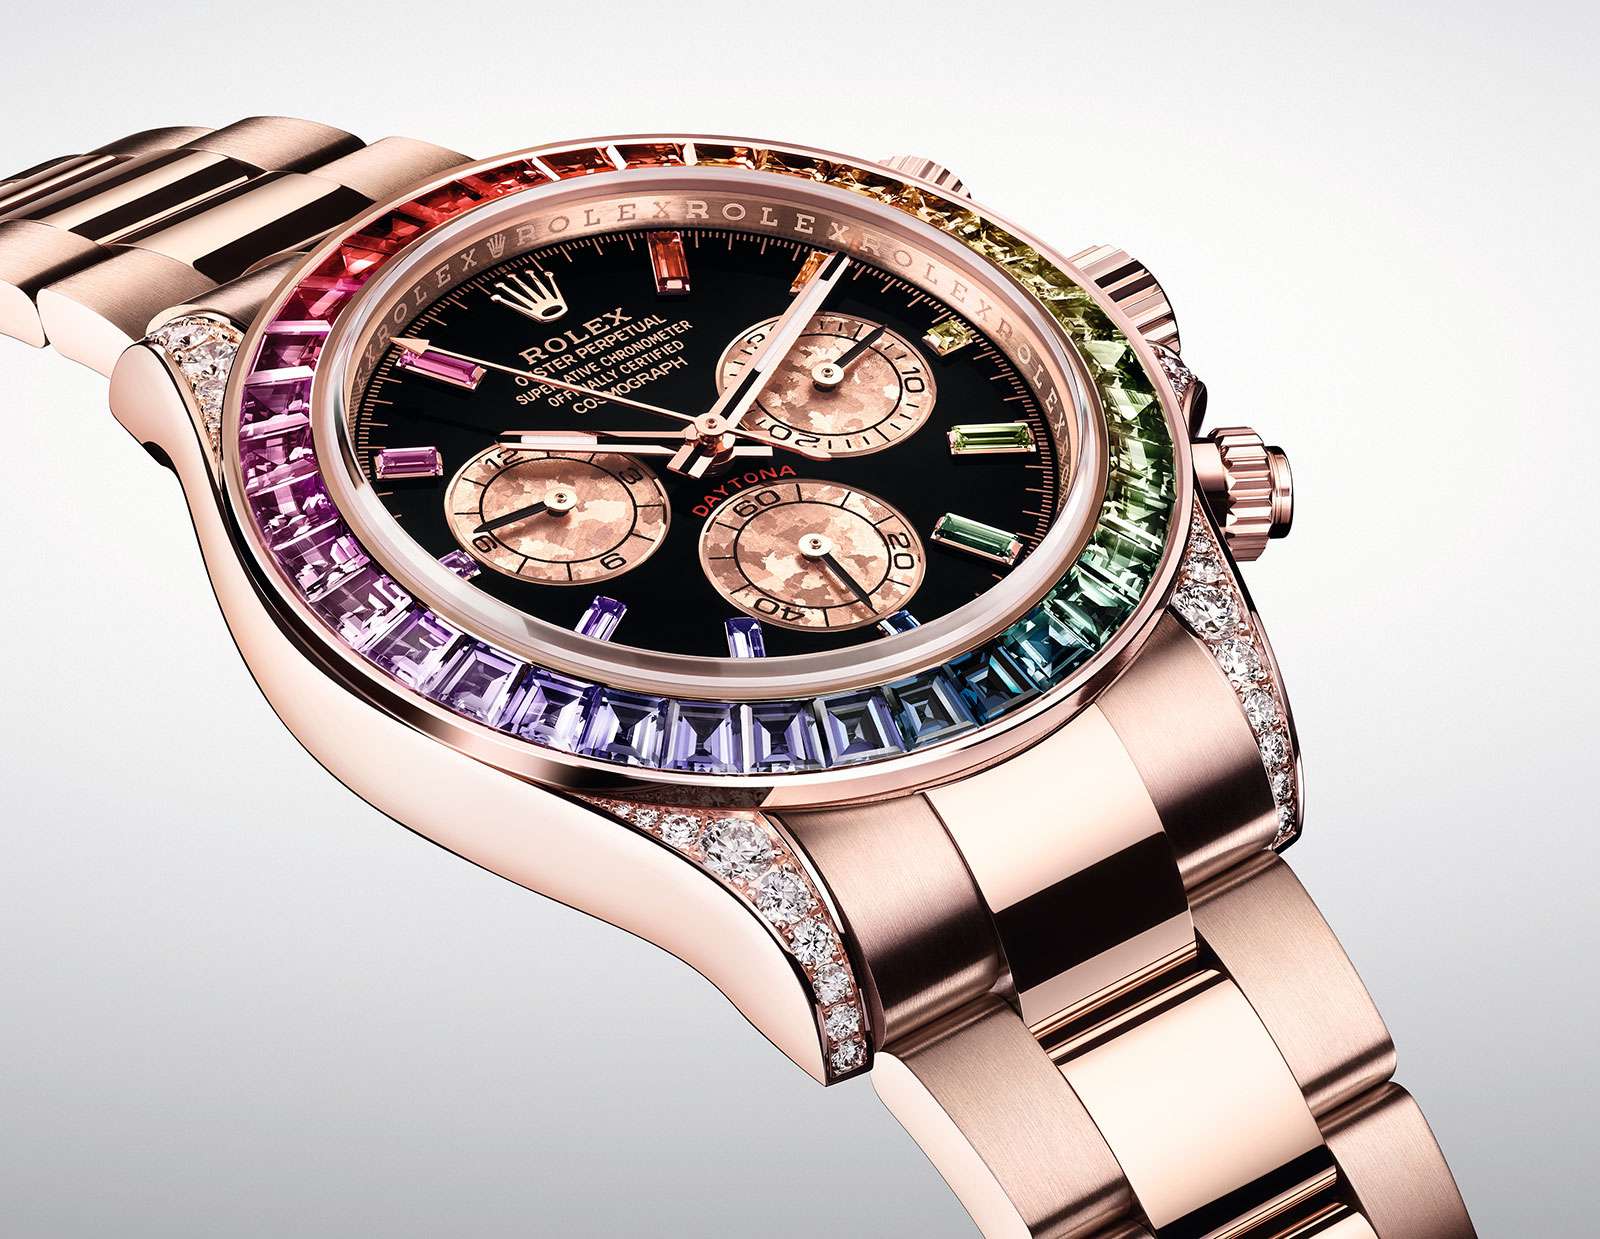 Rolex Daytona Rainbow Everose 116595 RBOW 3